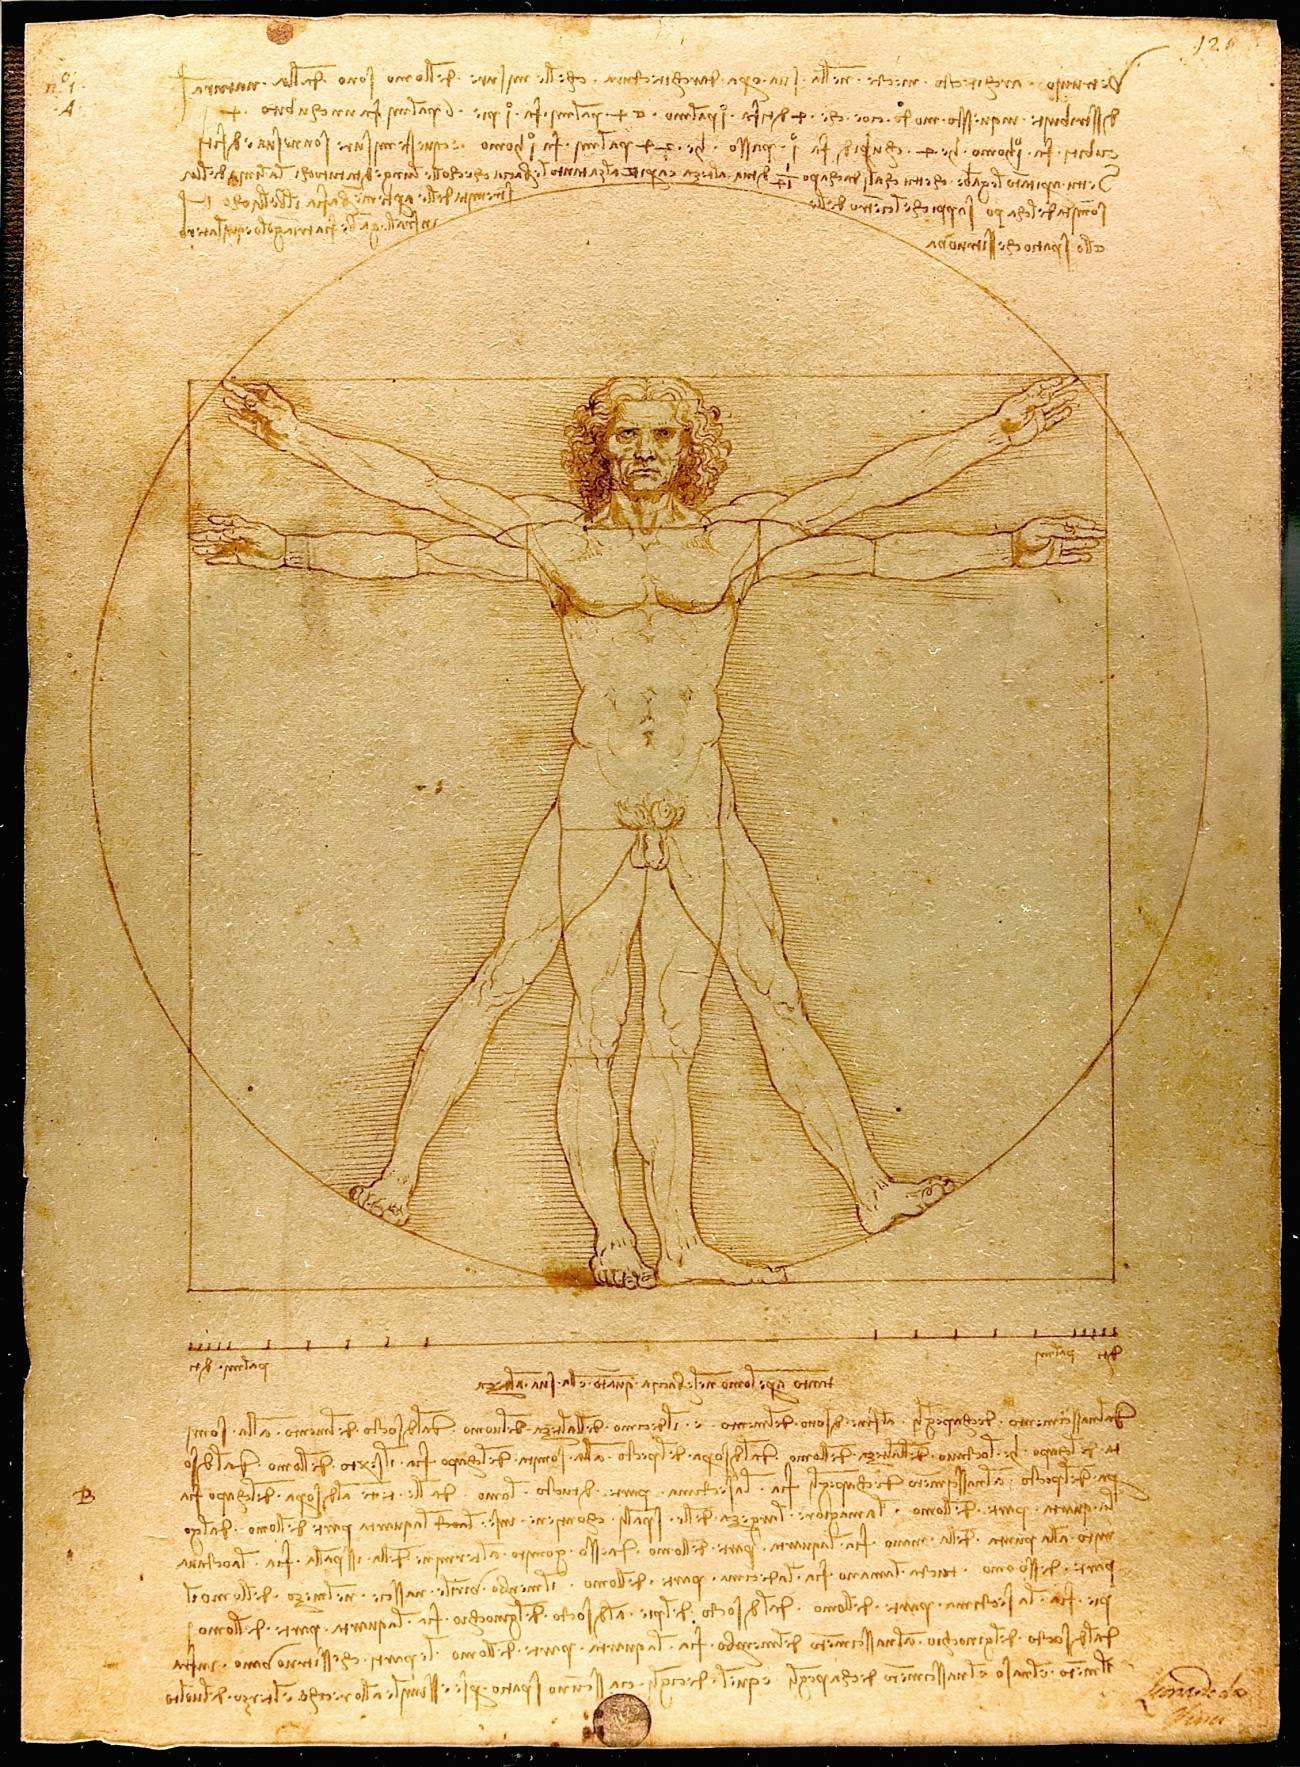 El hombre de Vitruvio. Obra de Leonardo da Vinci que representa un estudio de las proporciones de la figura masculina. Imagen: Wikipedia